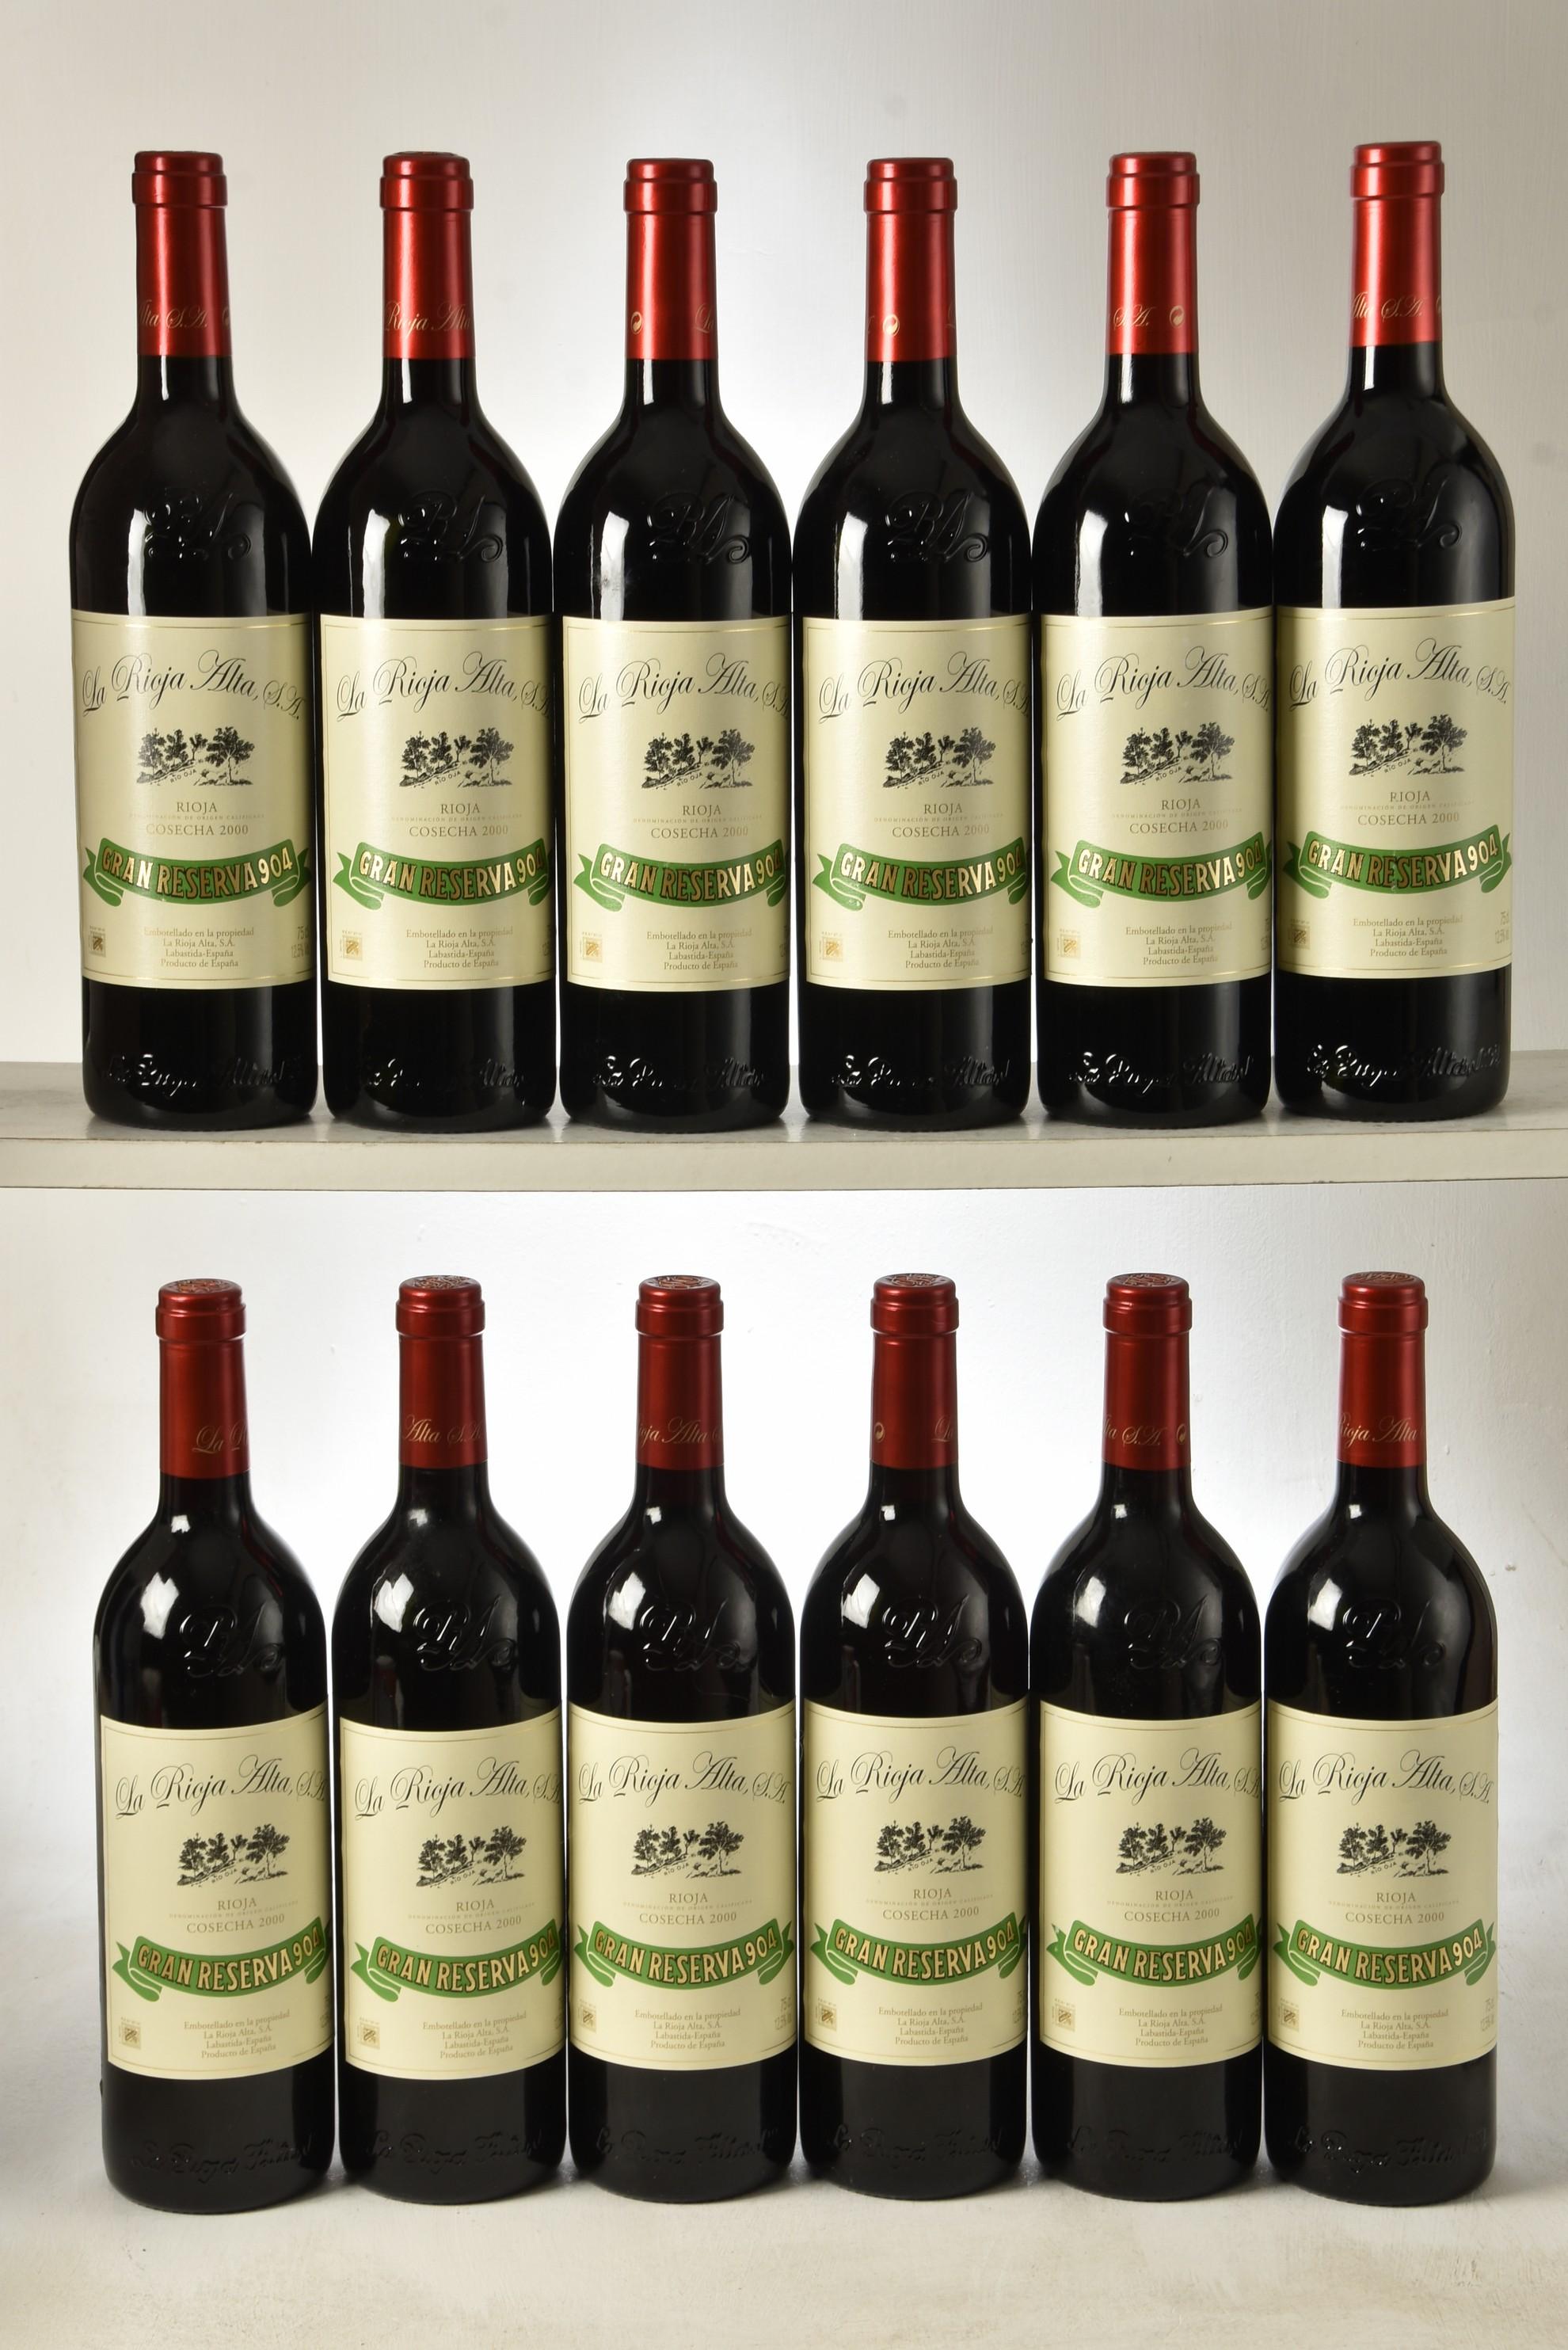 Gran Reserva 904, La Rioja Alta, Rioja, Spain 2000 12 bts OCC IN BOND